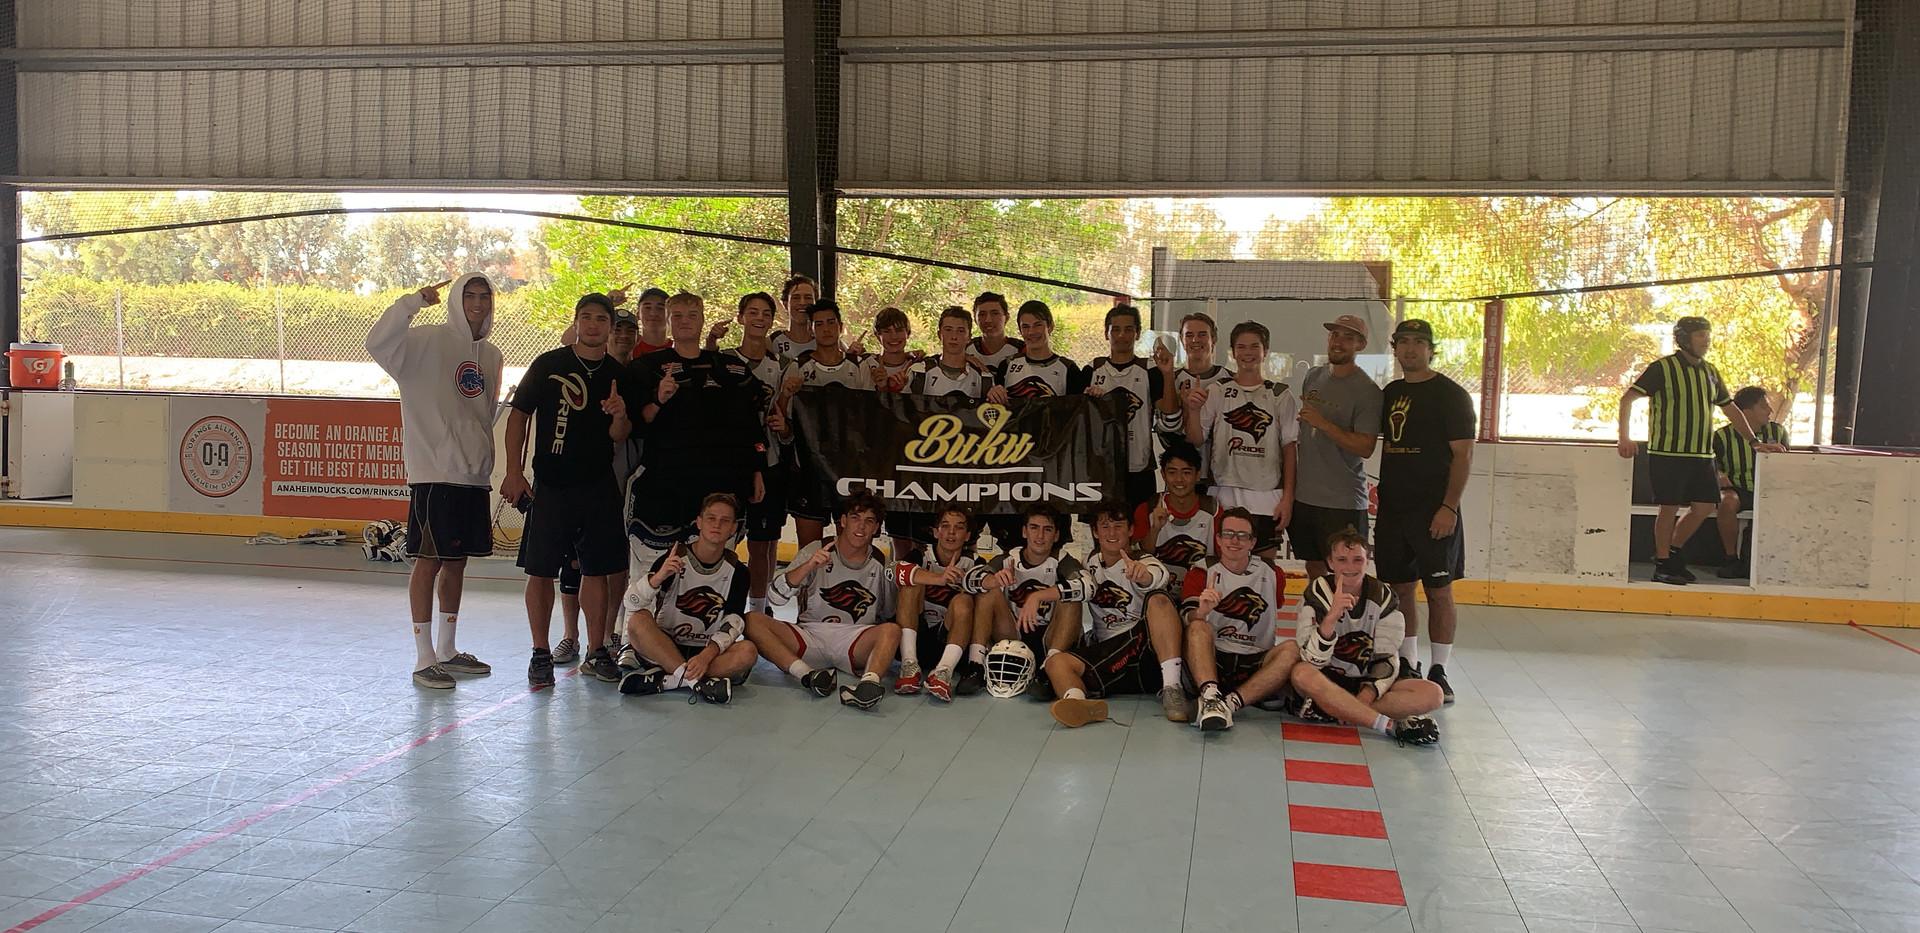 Gold Varsity Champions OC Pride.JPG